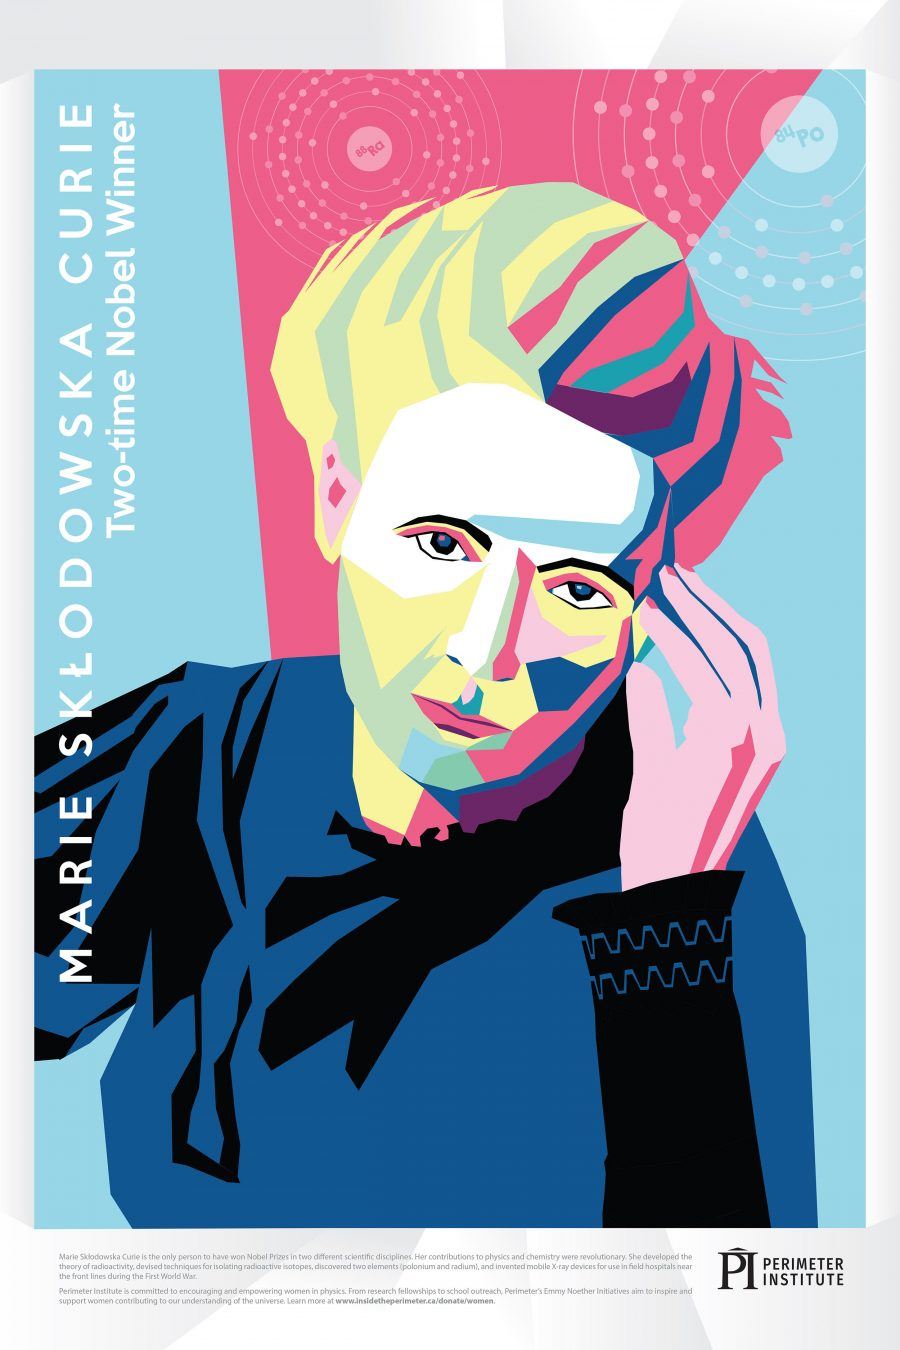 pop art posters celebrate pioneering women scientists download free